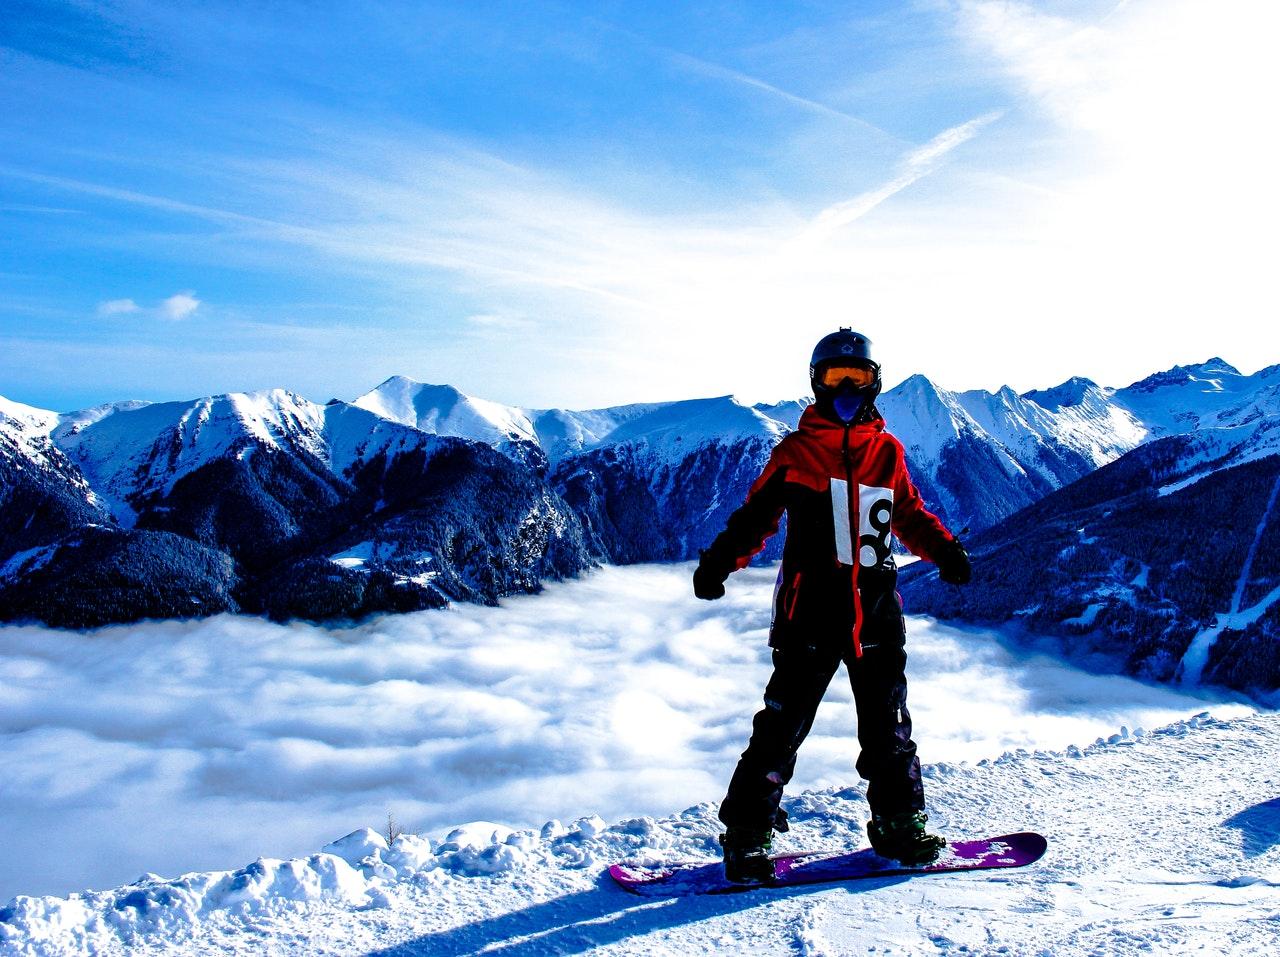 momentum snowboarding